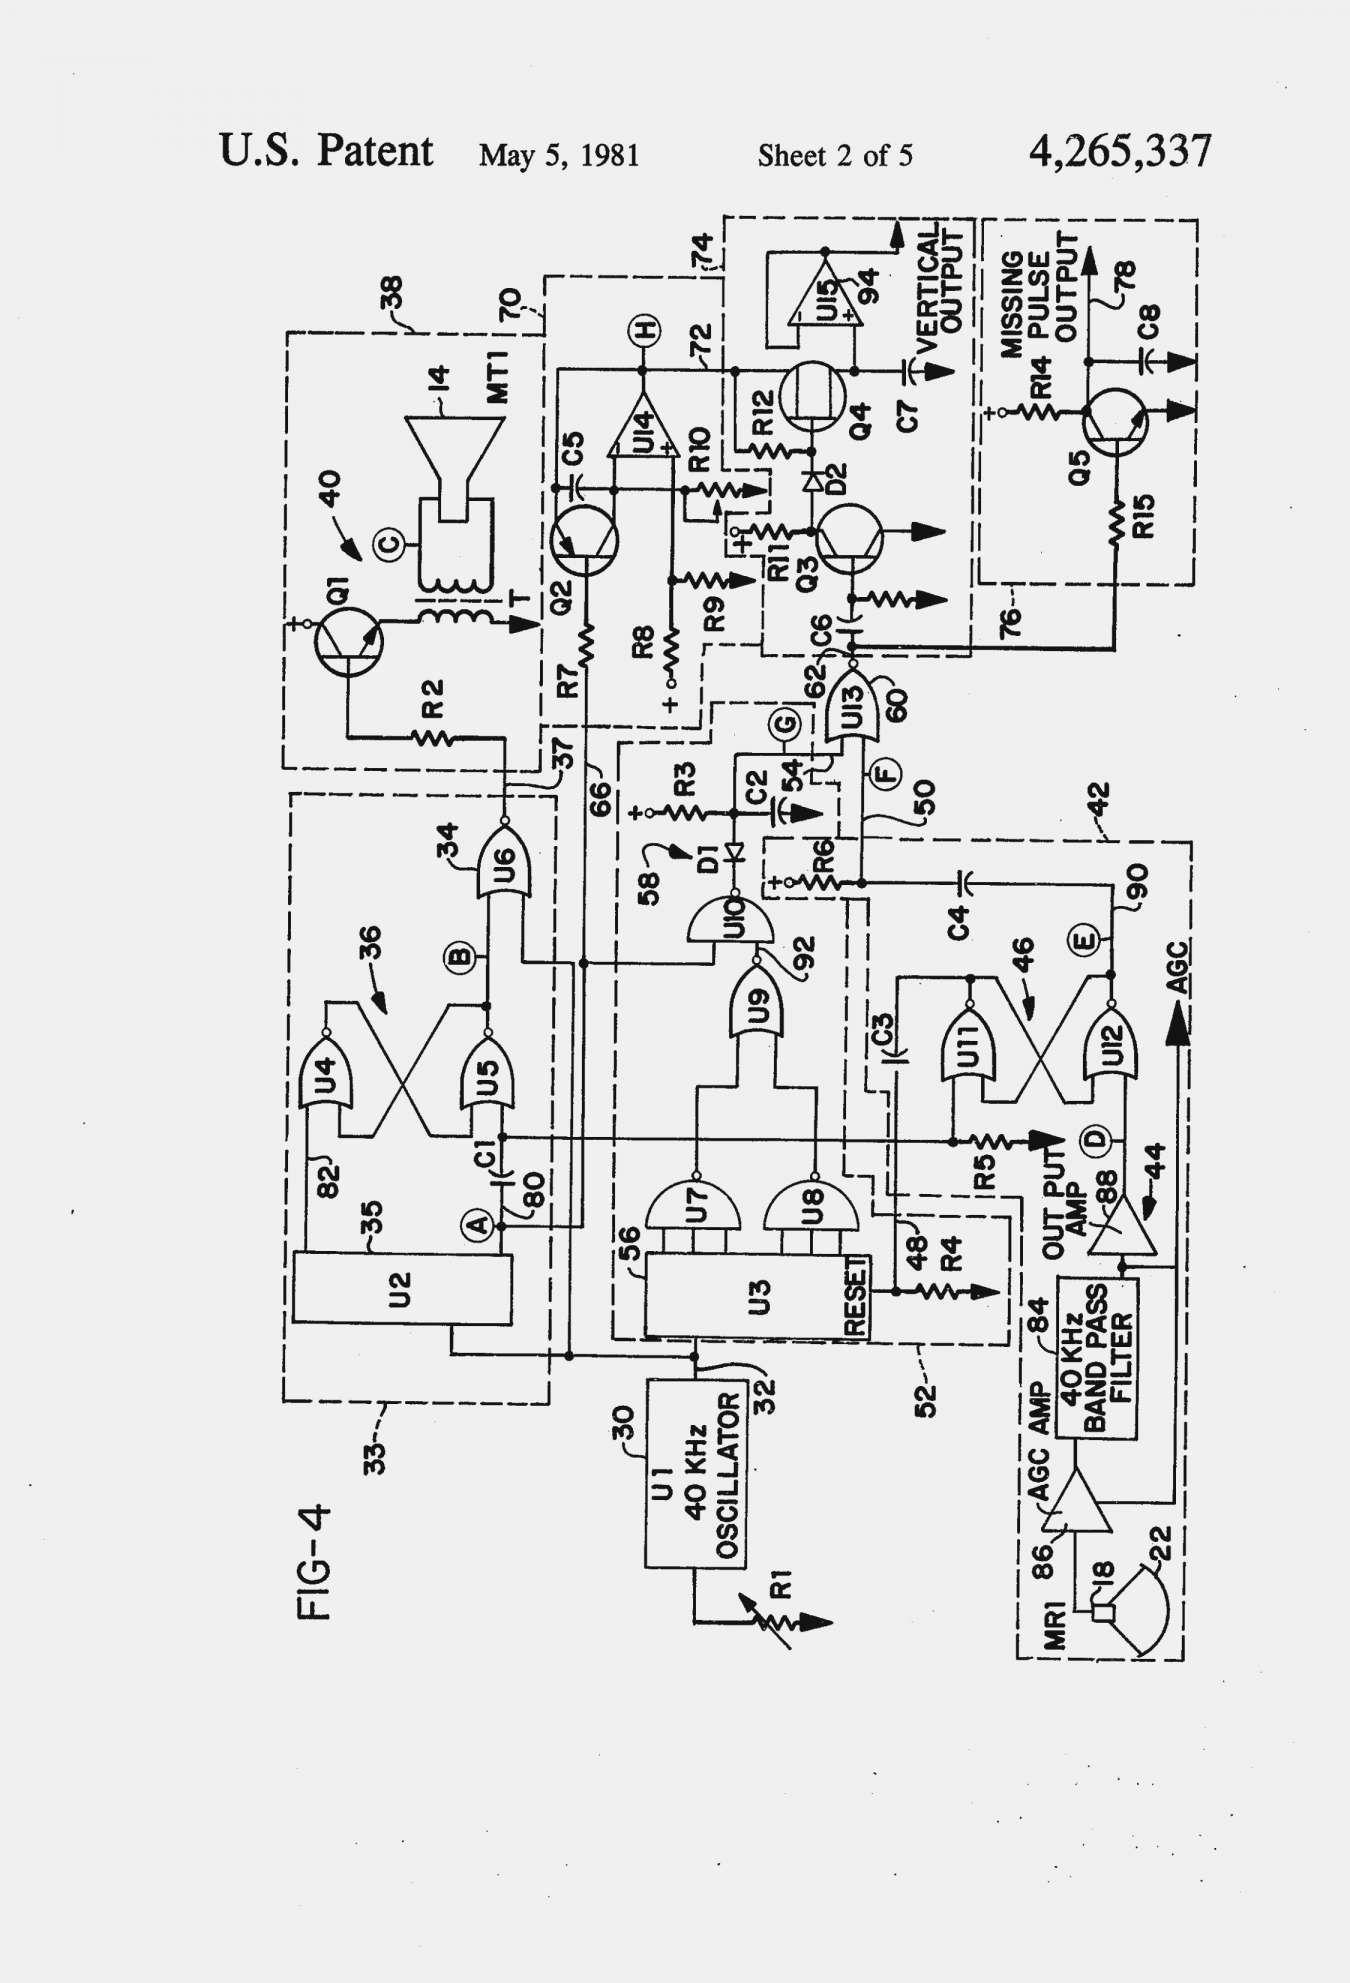 17 Clark Electric Forklift Wiring Diagram